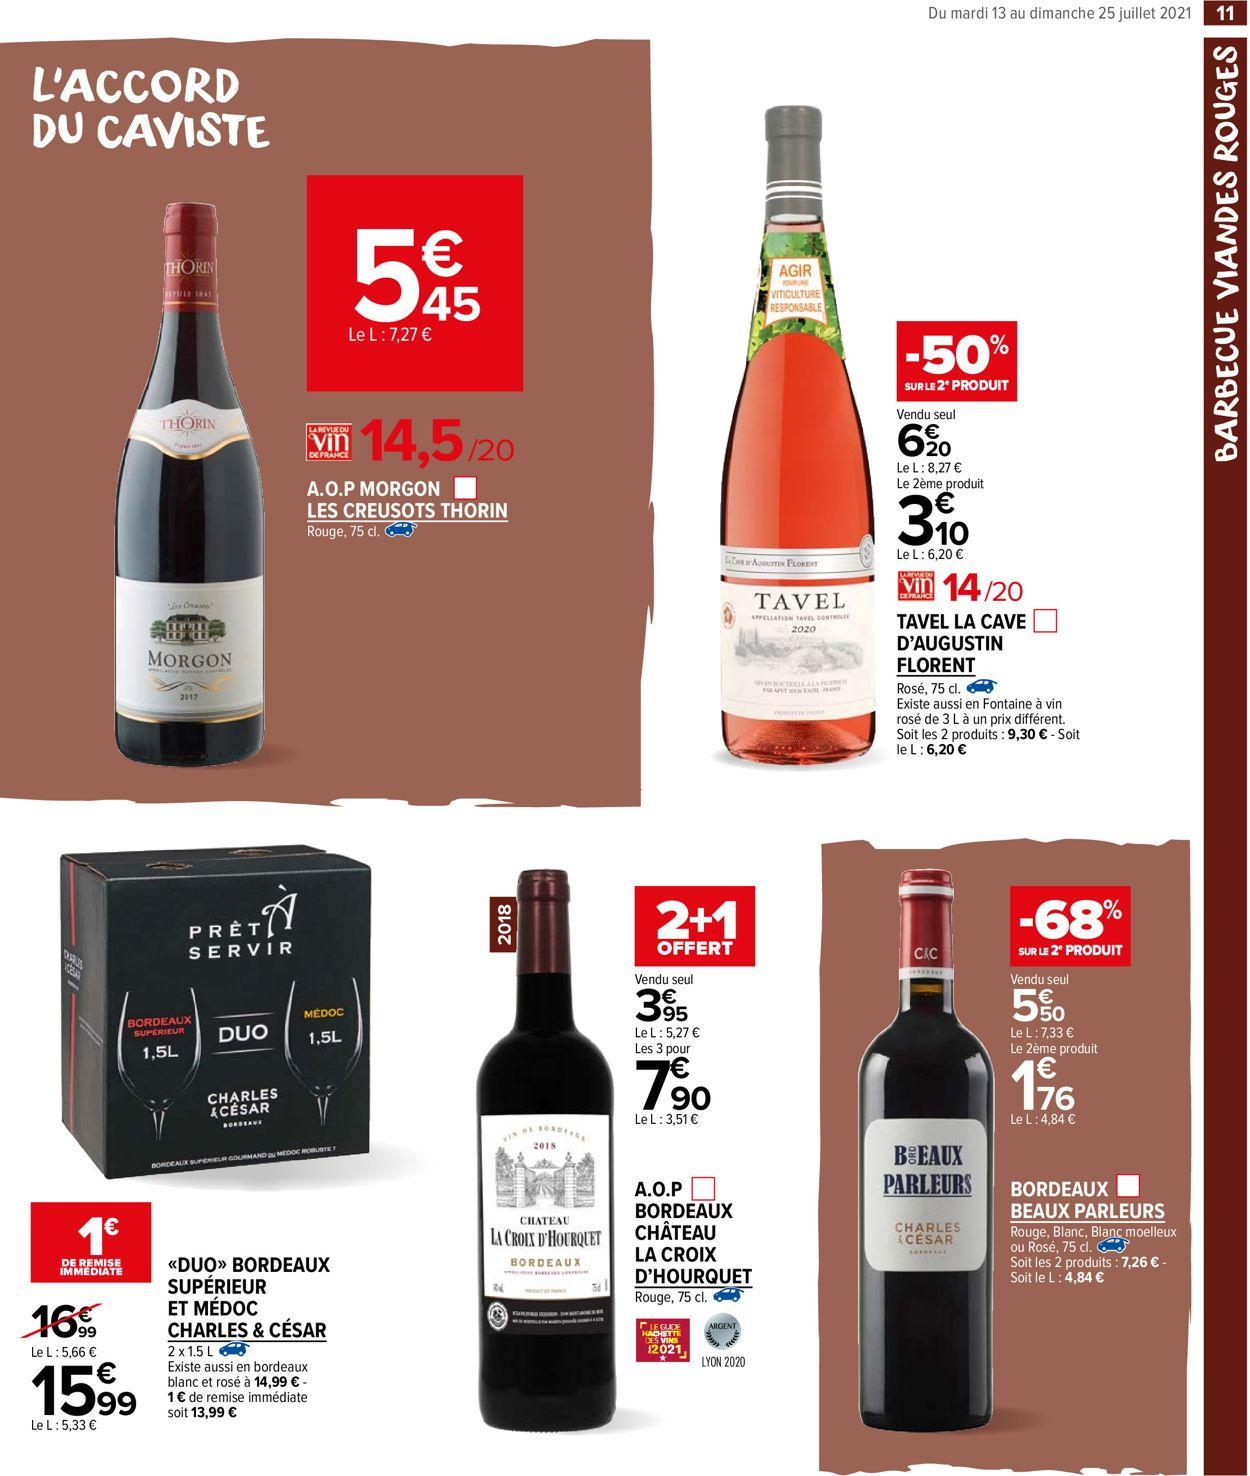 Carrefour Catalogue - 13.07-25.07.2021 (Page 11)